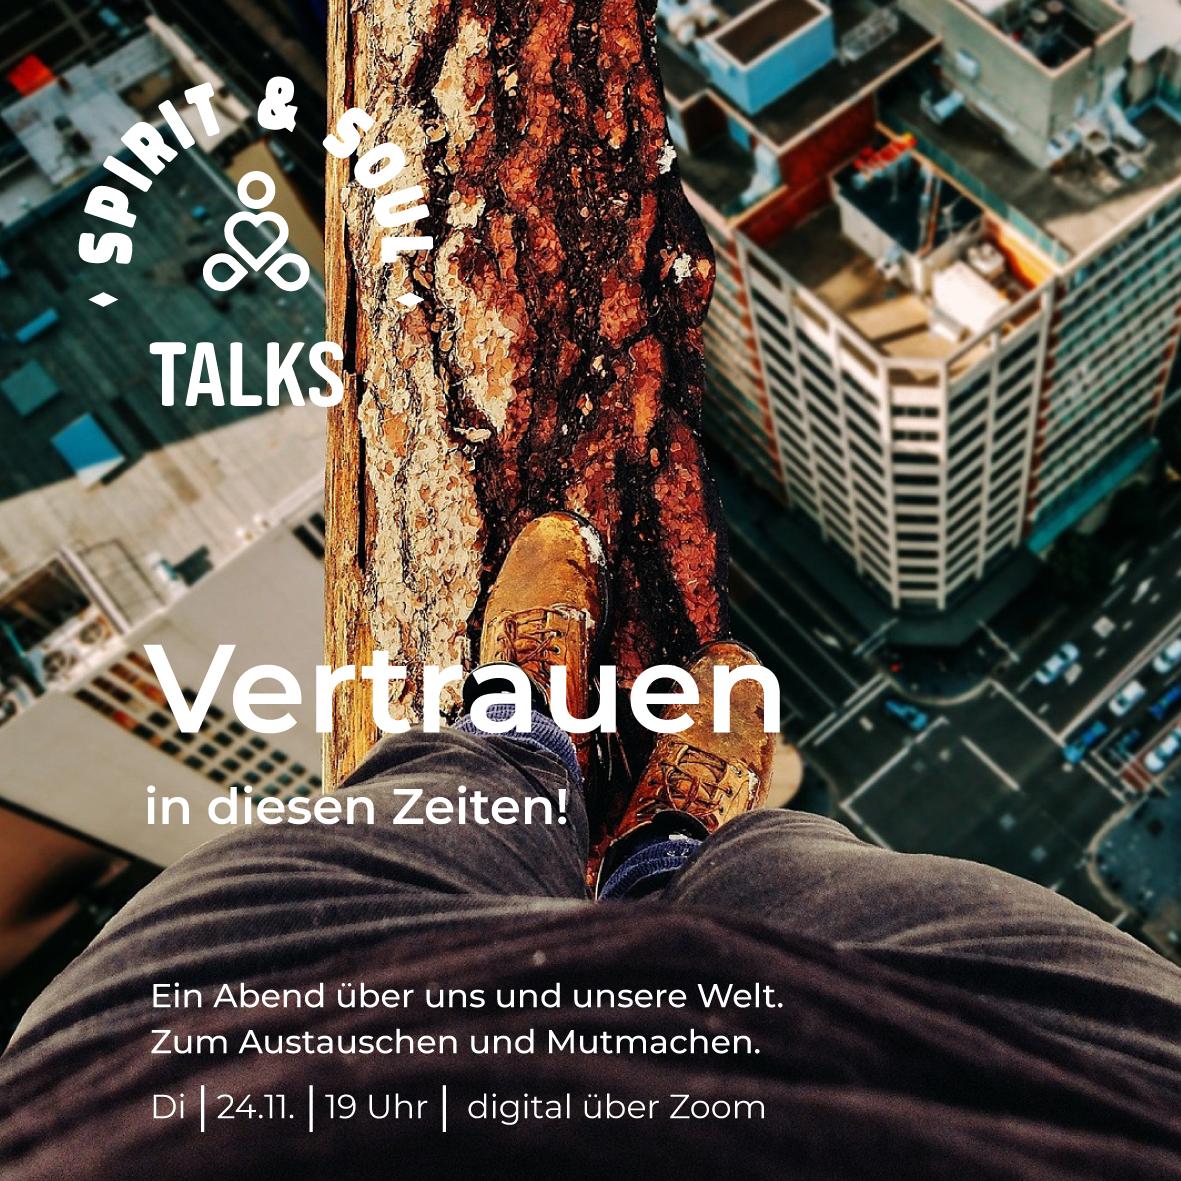 201110_S&S_Talks_Vertrauen_B.indd